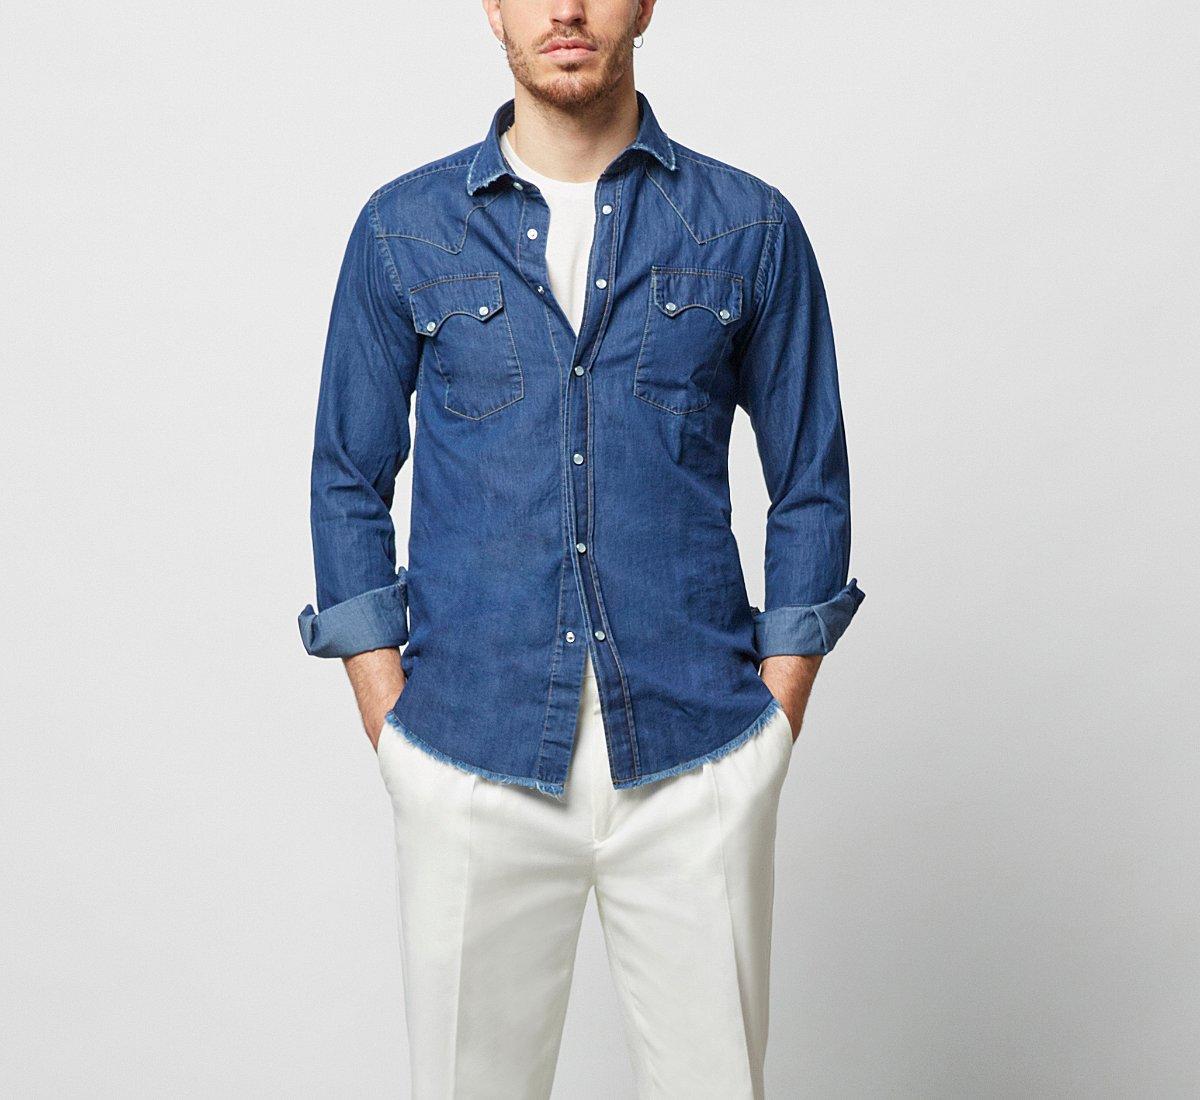 Cotton denim shirt